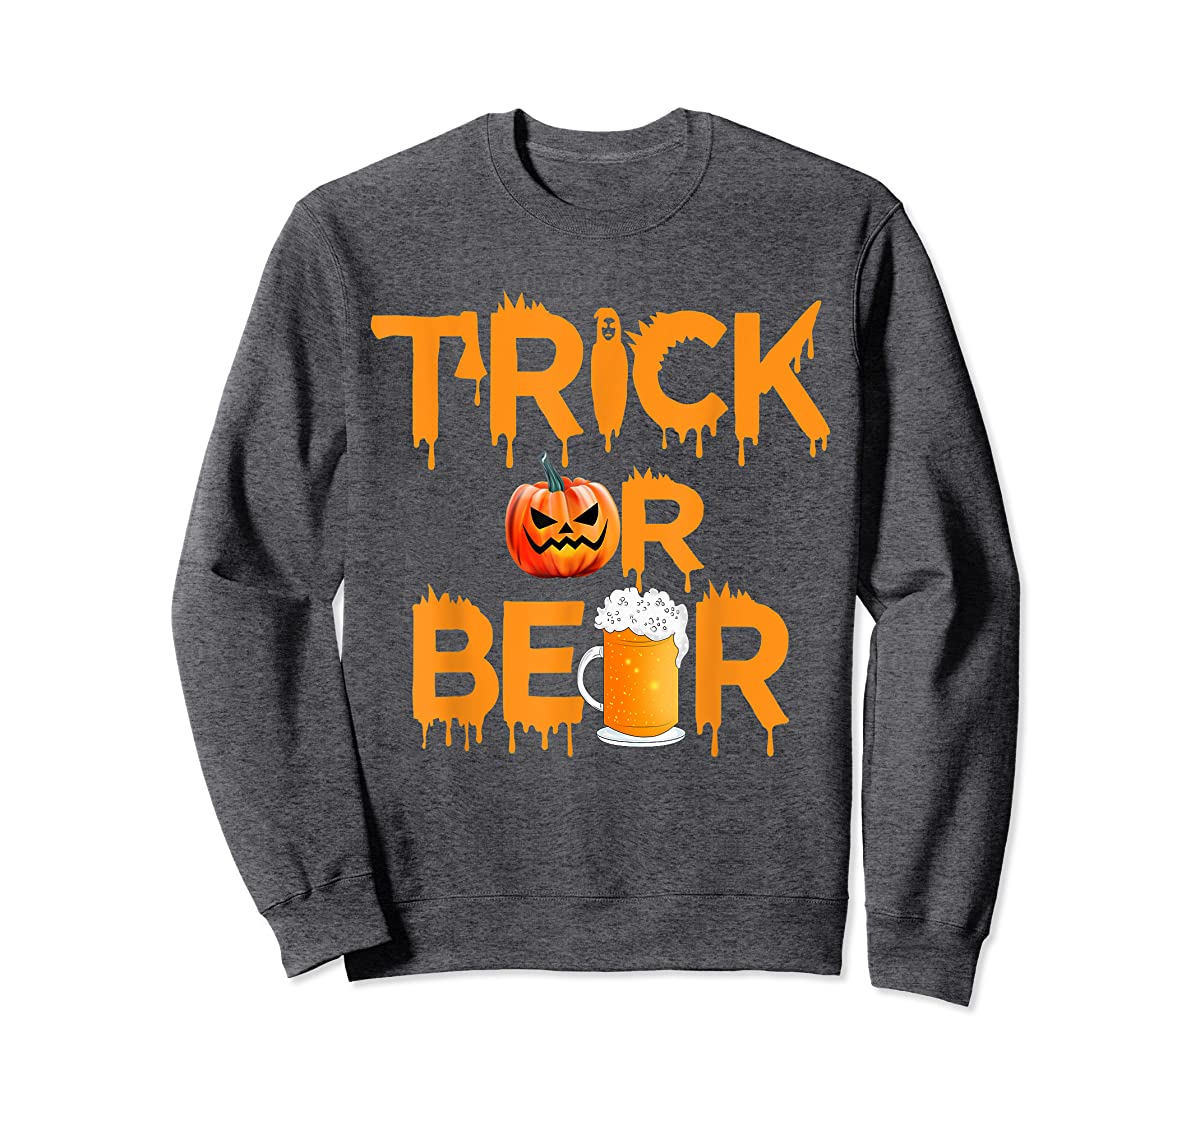 Halloween Costume Trick or Beer Drinking T Shirt Pumpkin Men T-Shirt-Sweatshirt-Dark Heather